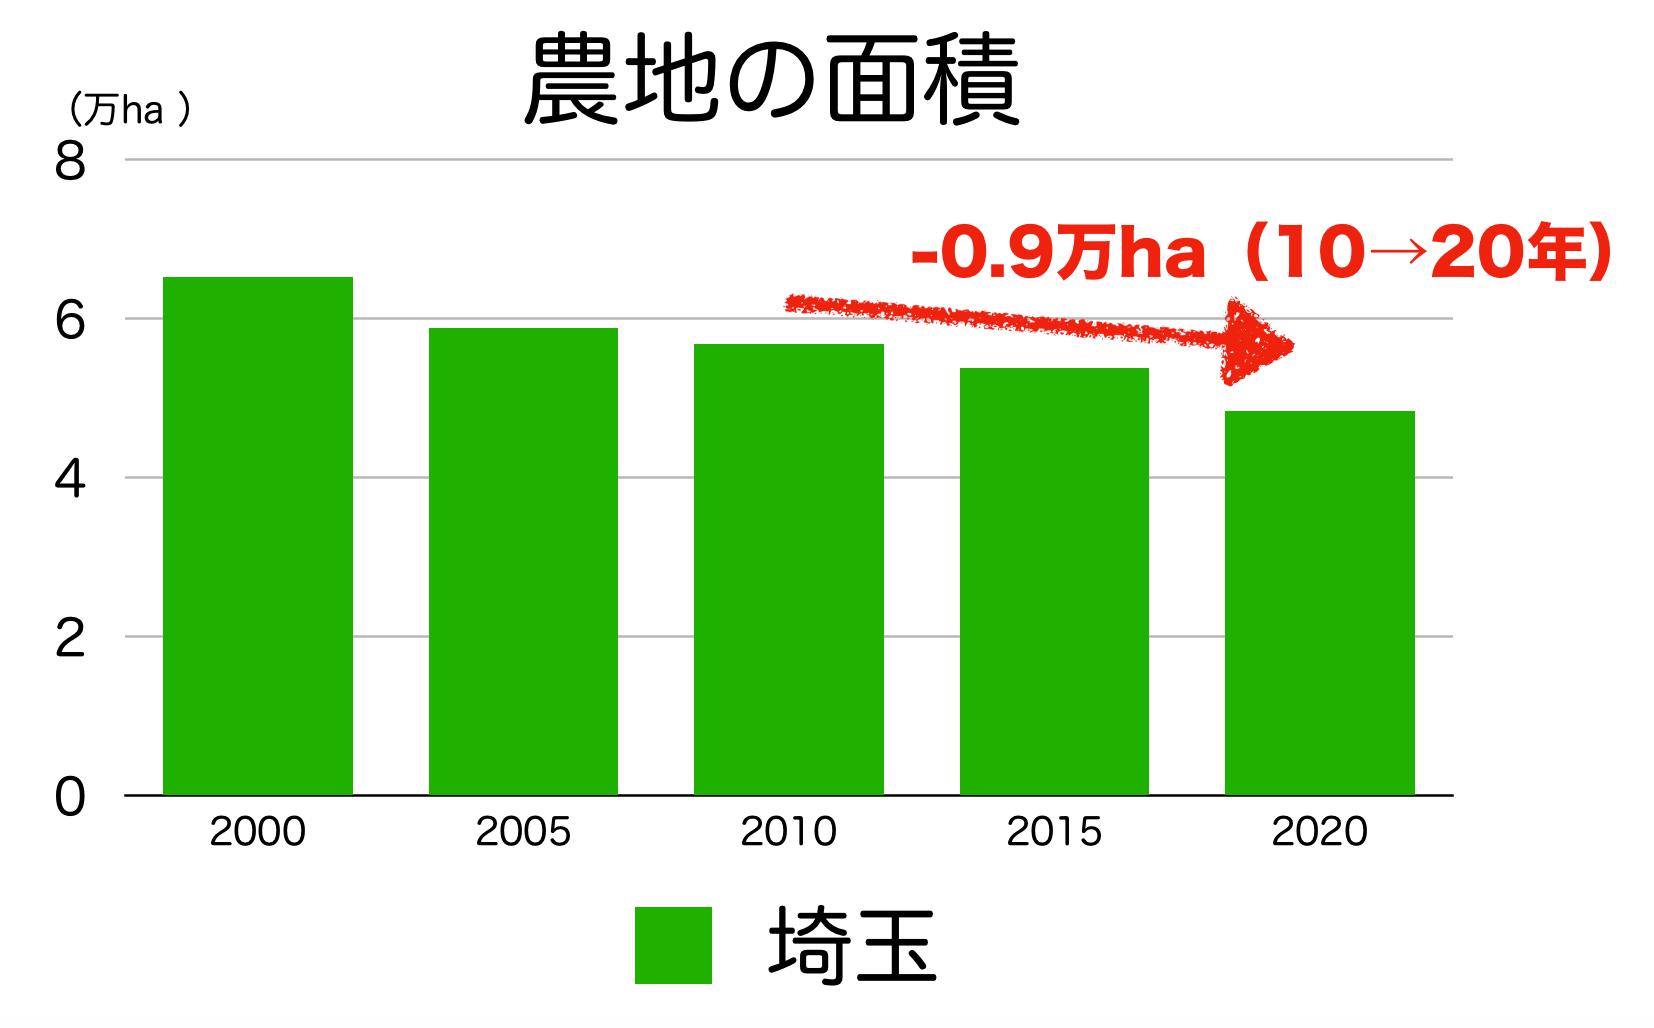 埼玉県の農地面積